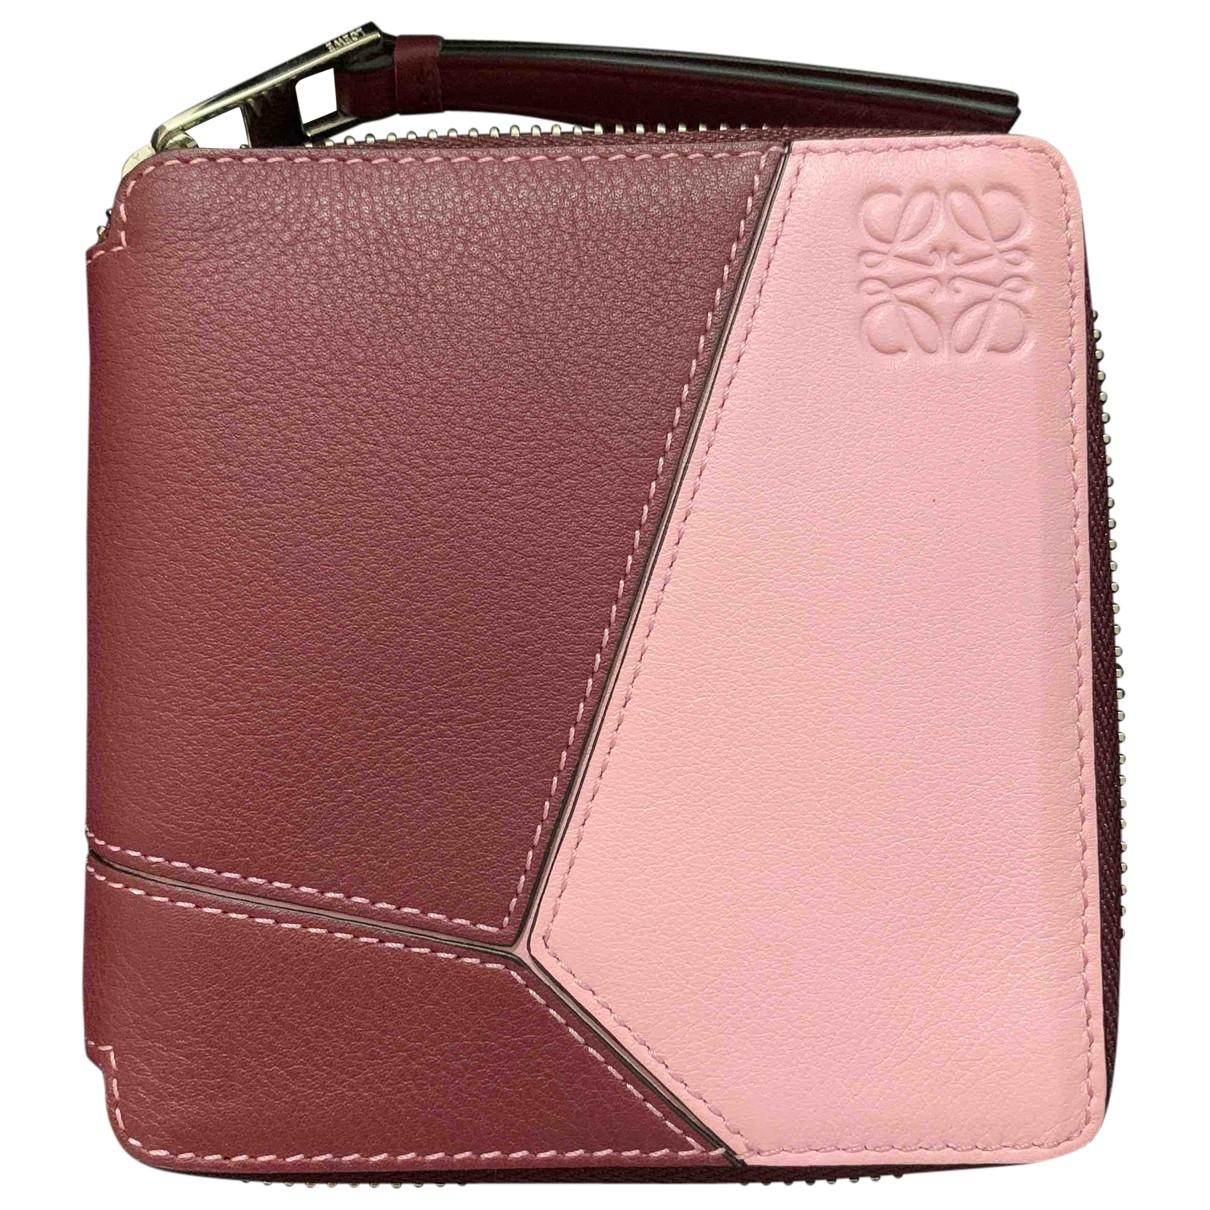 Loewe Puzzle Burgundy Leather wallet for Women \N